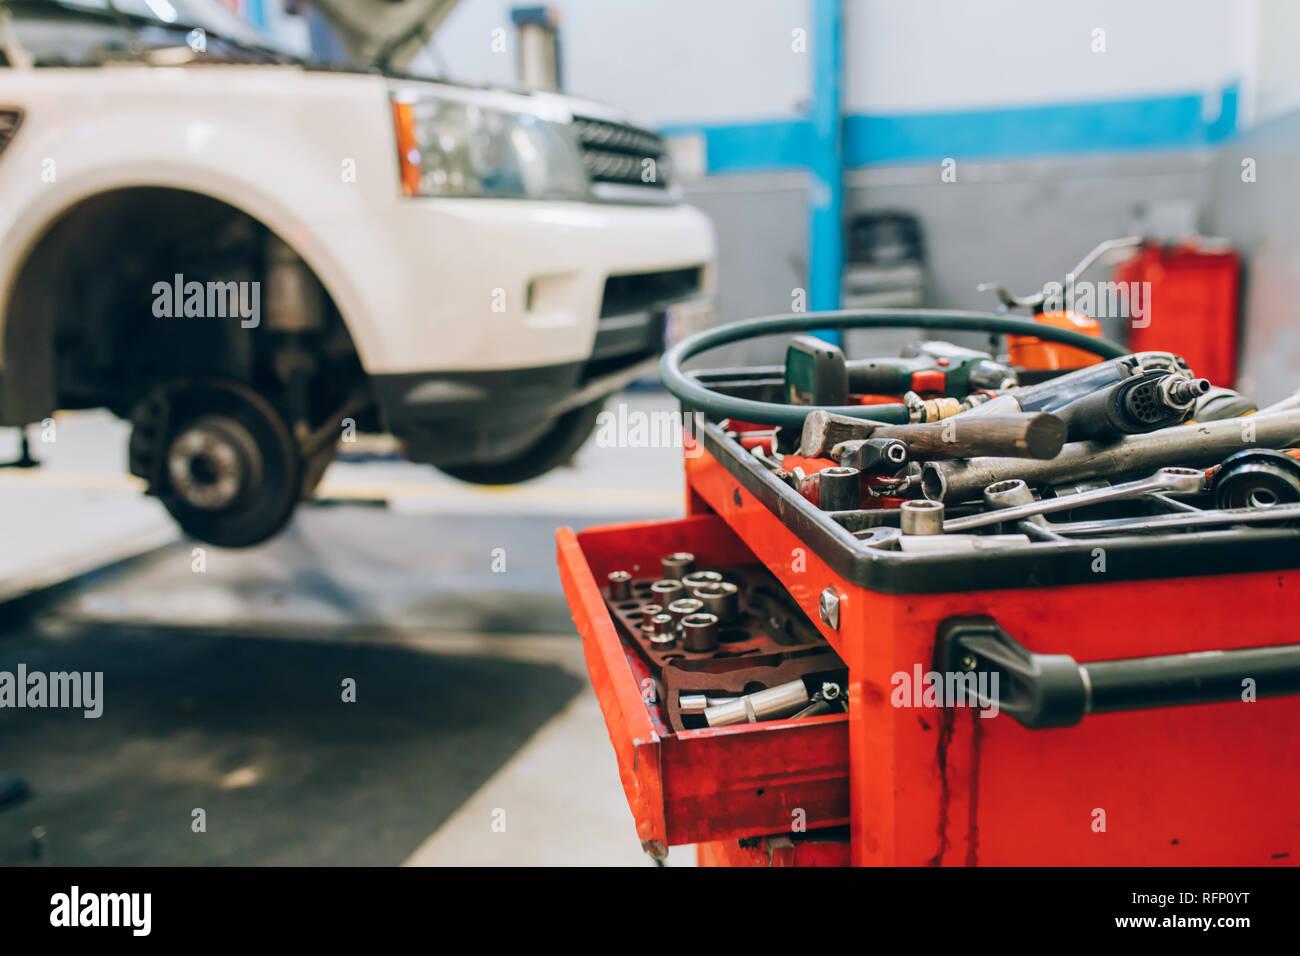 Car Repair And Maintenance >> Car Repair Maintenance Service Car Raised On Car Lift In